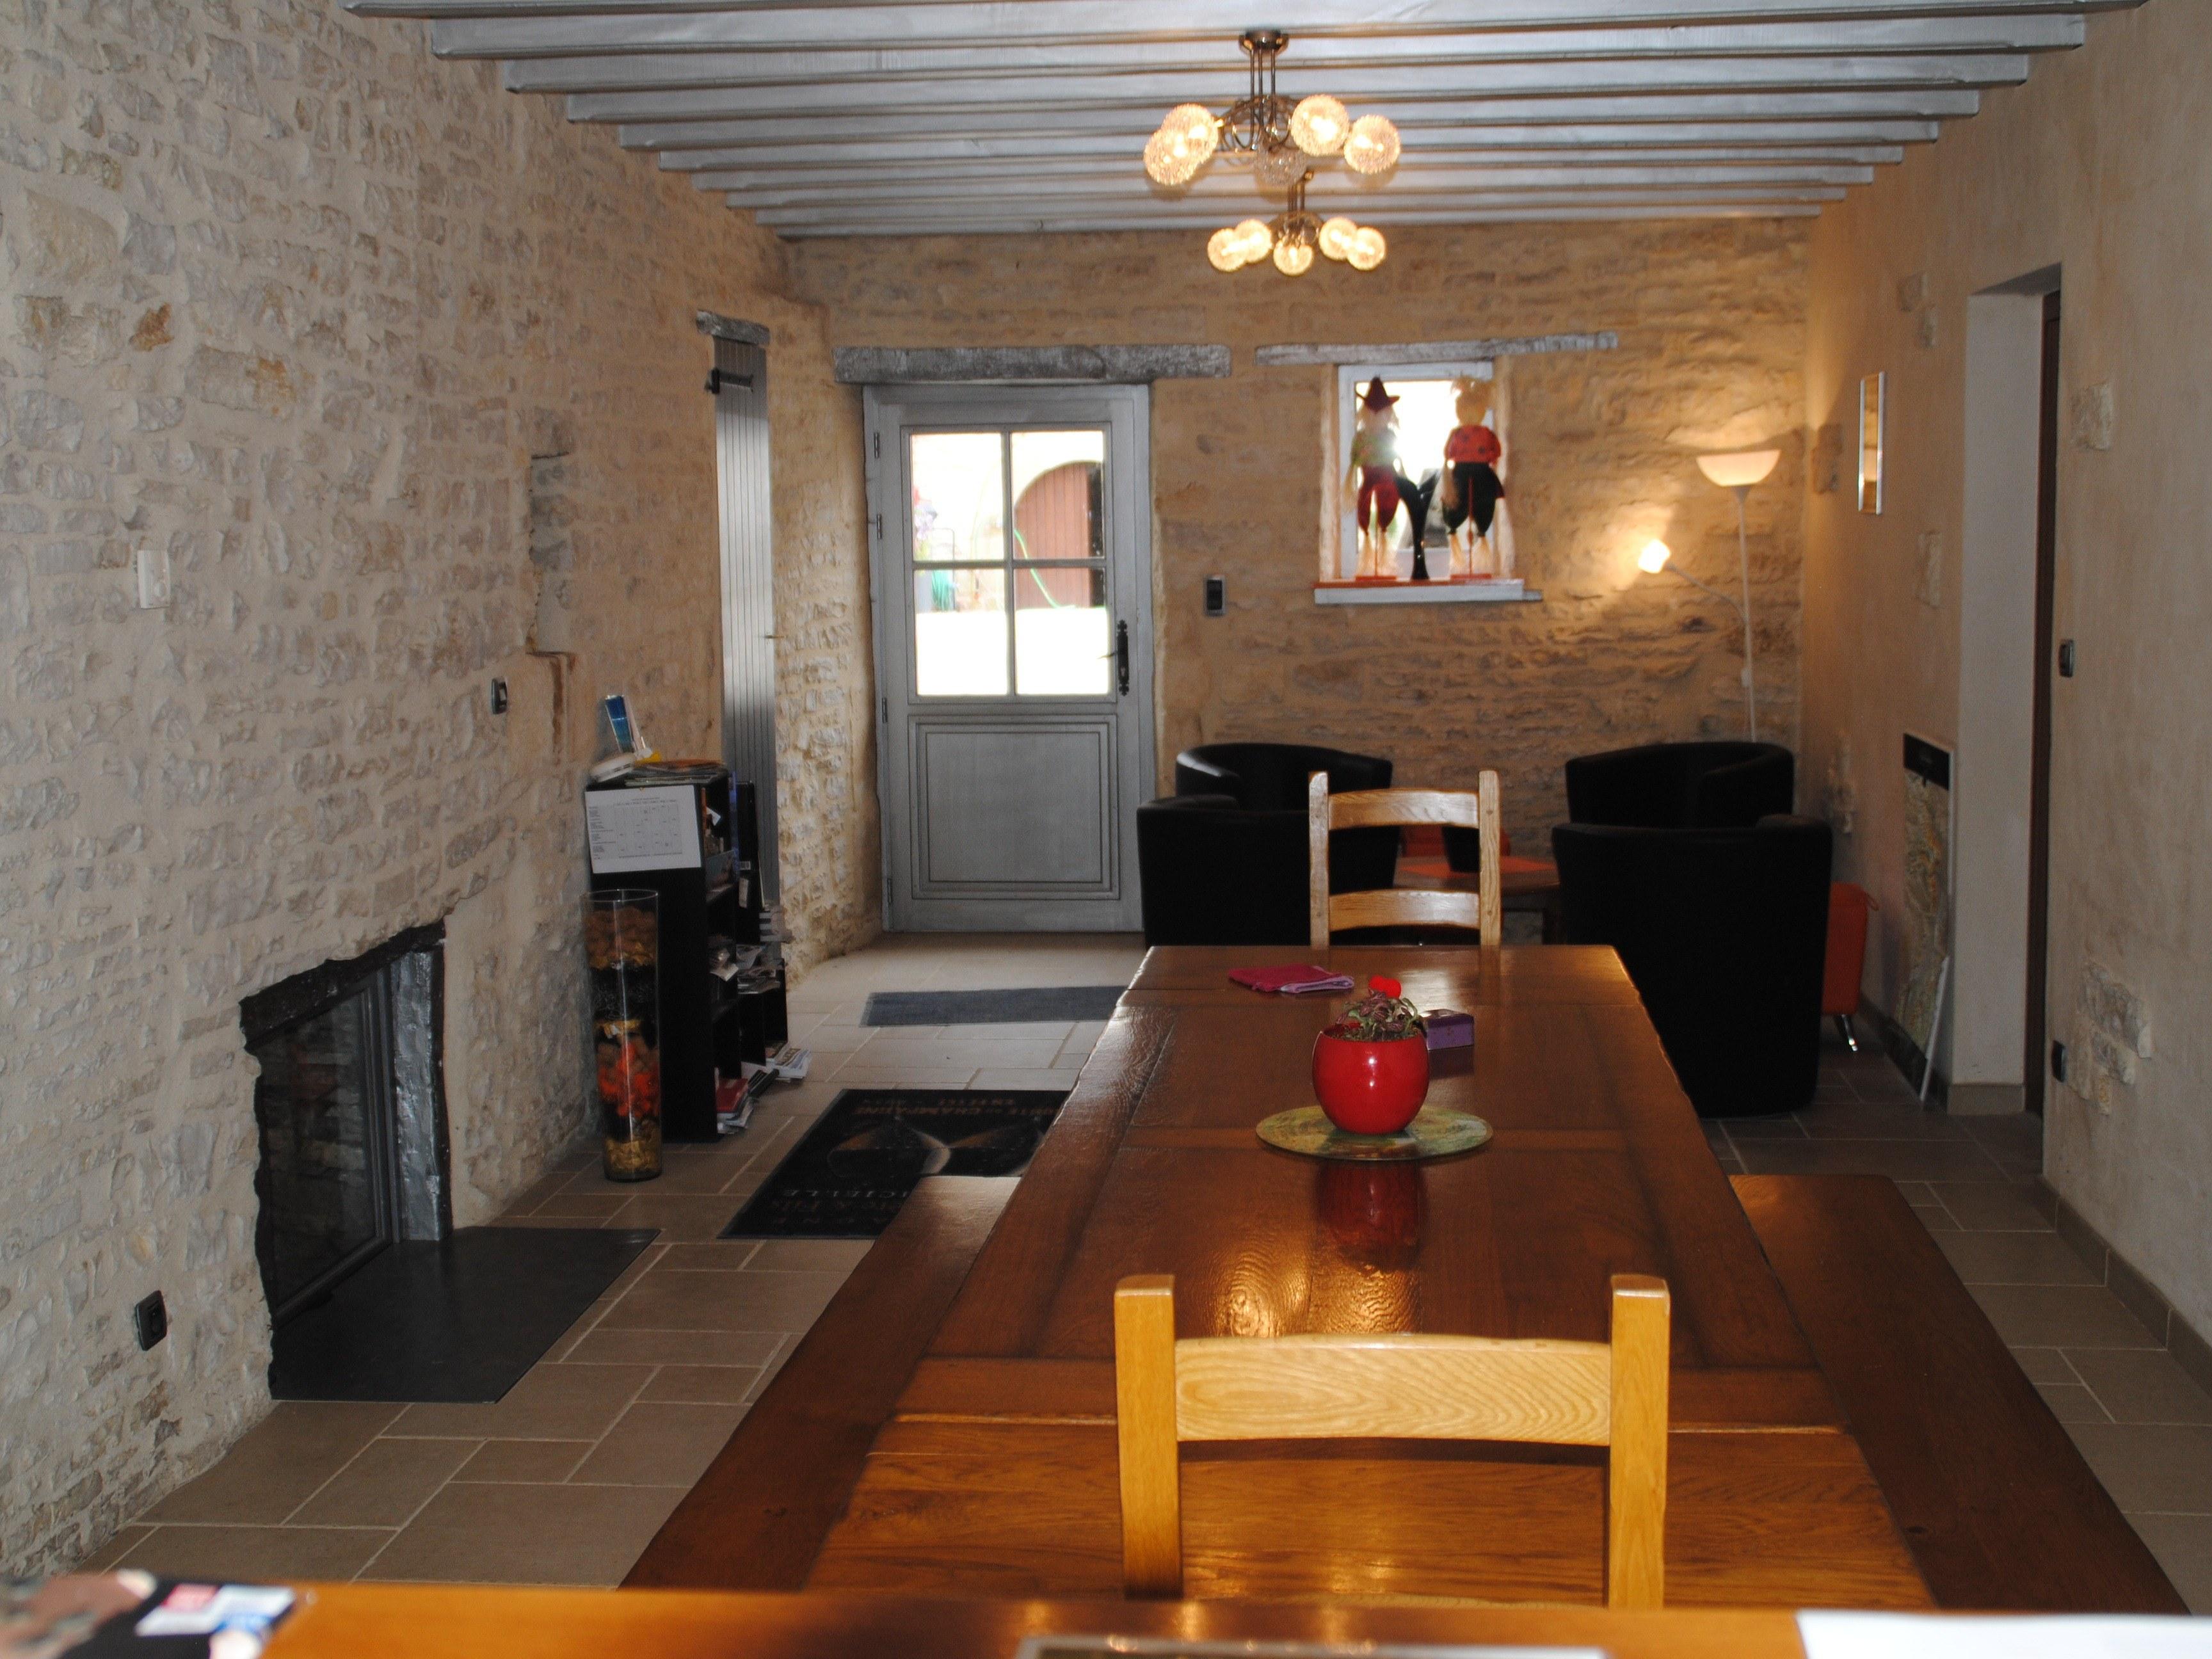 baroville-champagne-fauteuils-table-salon-cheminee